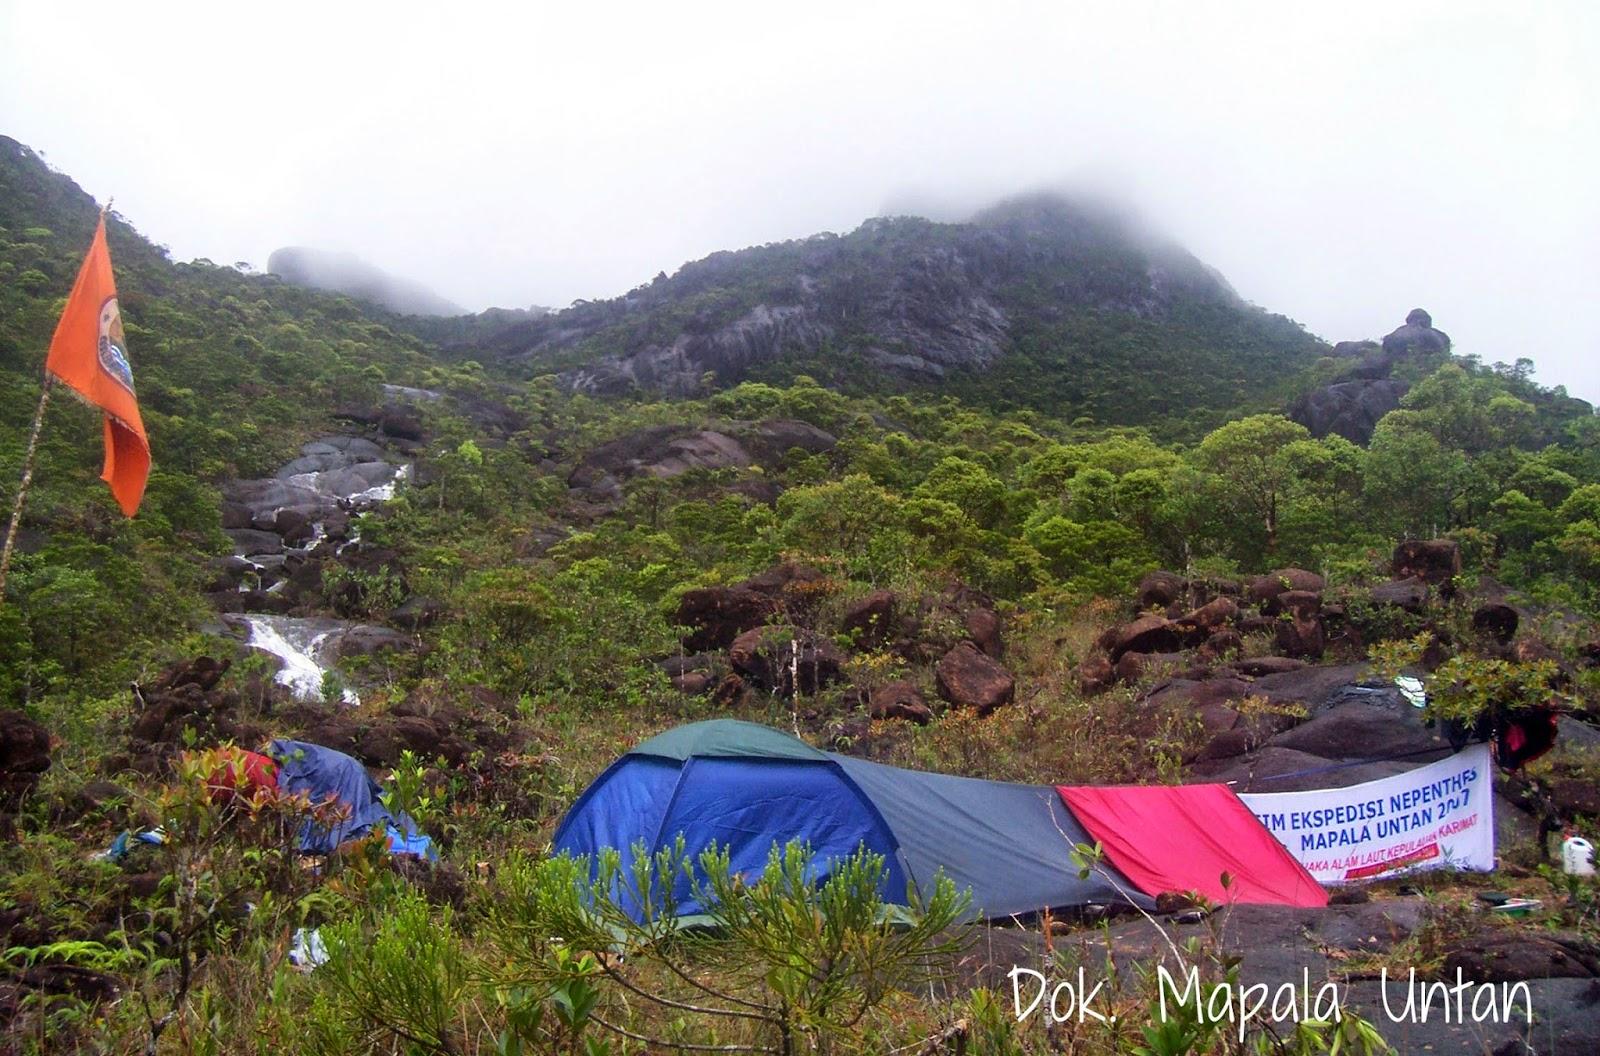 Ekspedisi Nepenthes Berteman Badai Karimata Mapala Untan Pulau Terletak Lebih